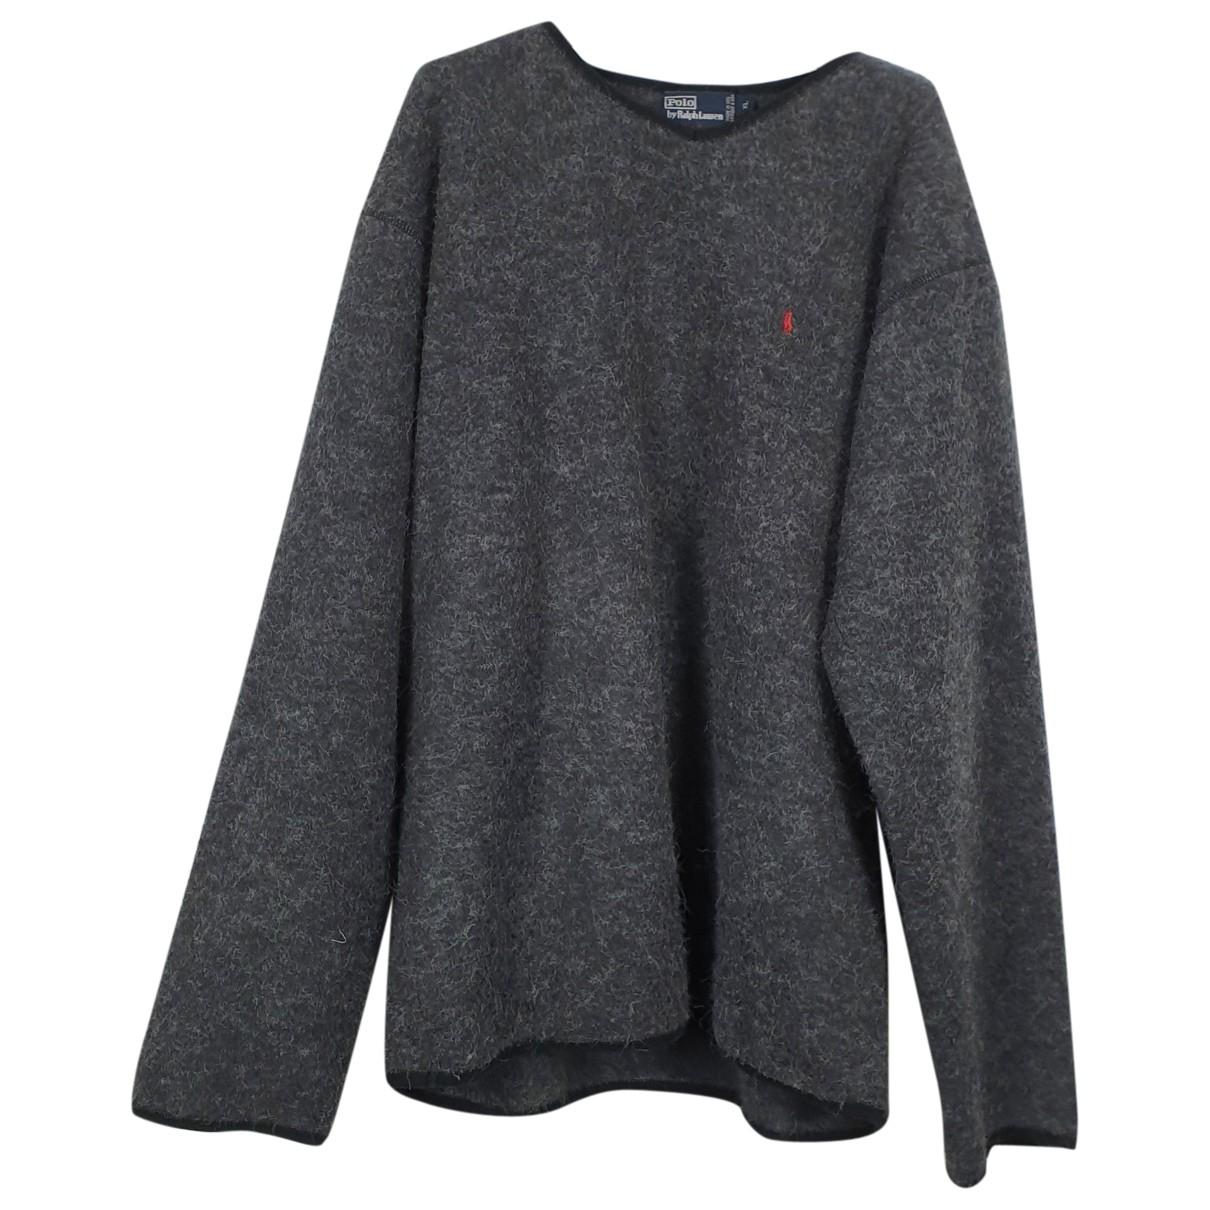 Polo Ralph Lauren \N Grey Knitwear & Sweatshirts for Men XL International